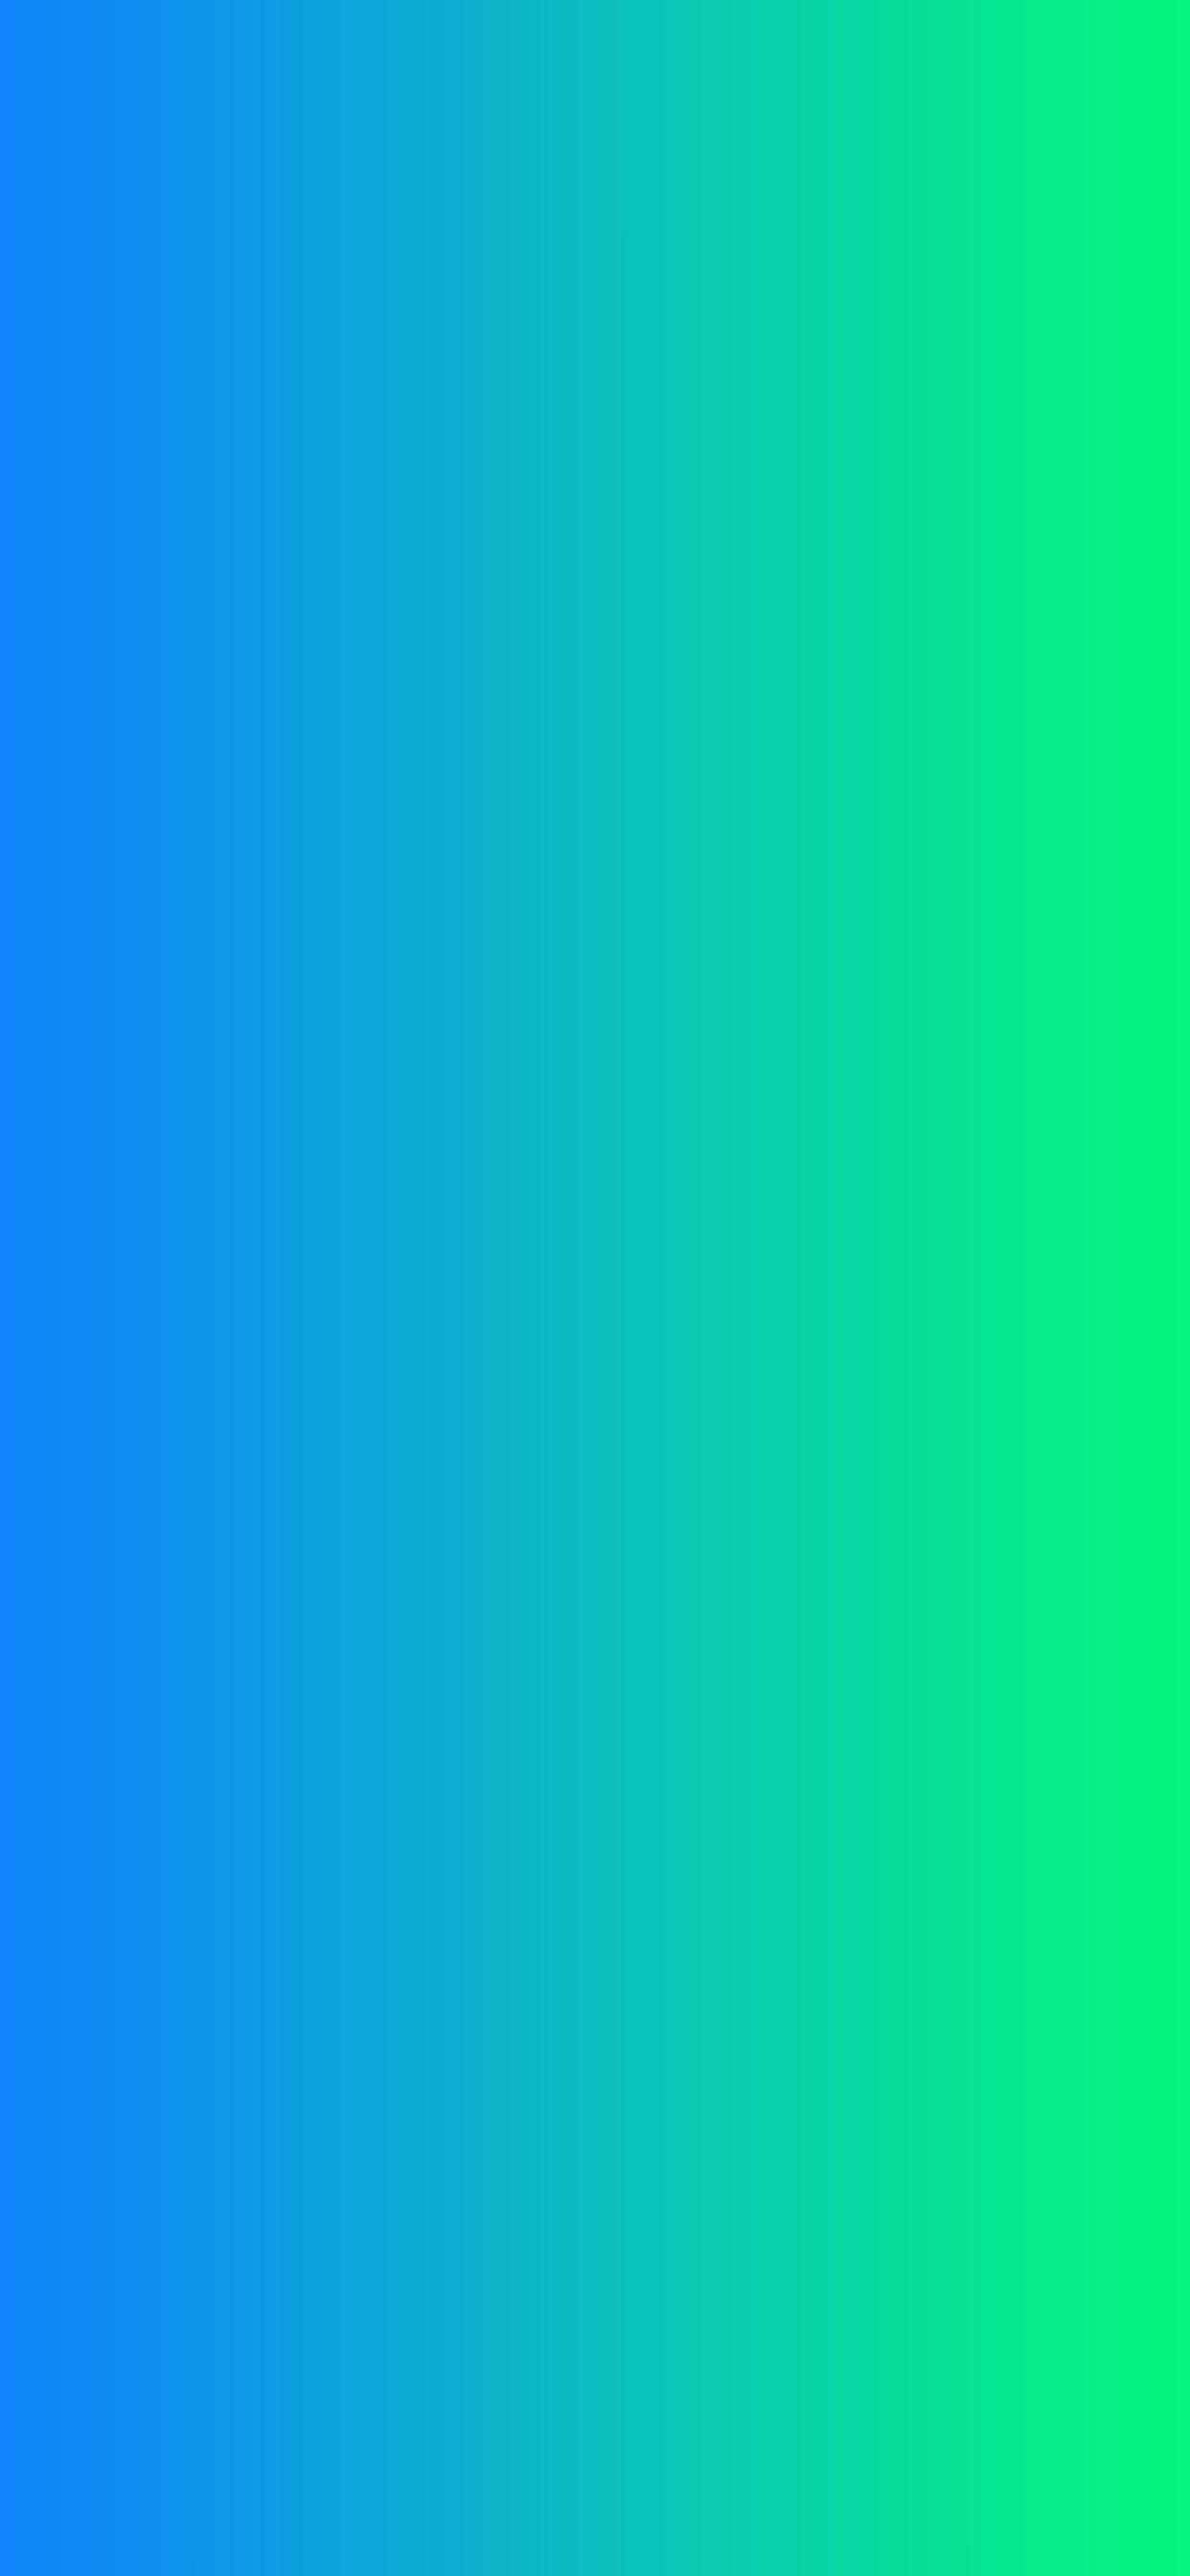 iPhone wallpaper gradient blue green Gradient colors